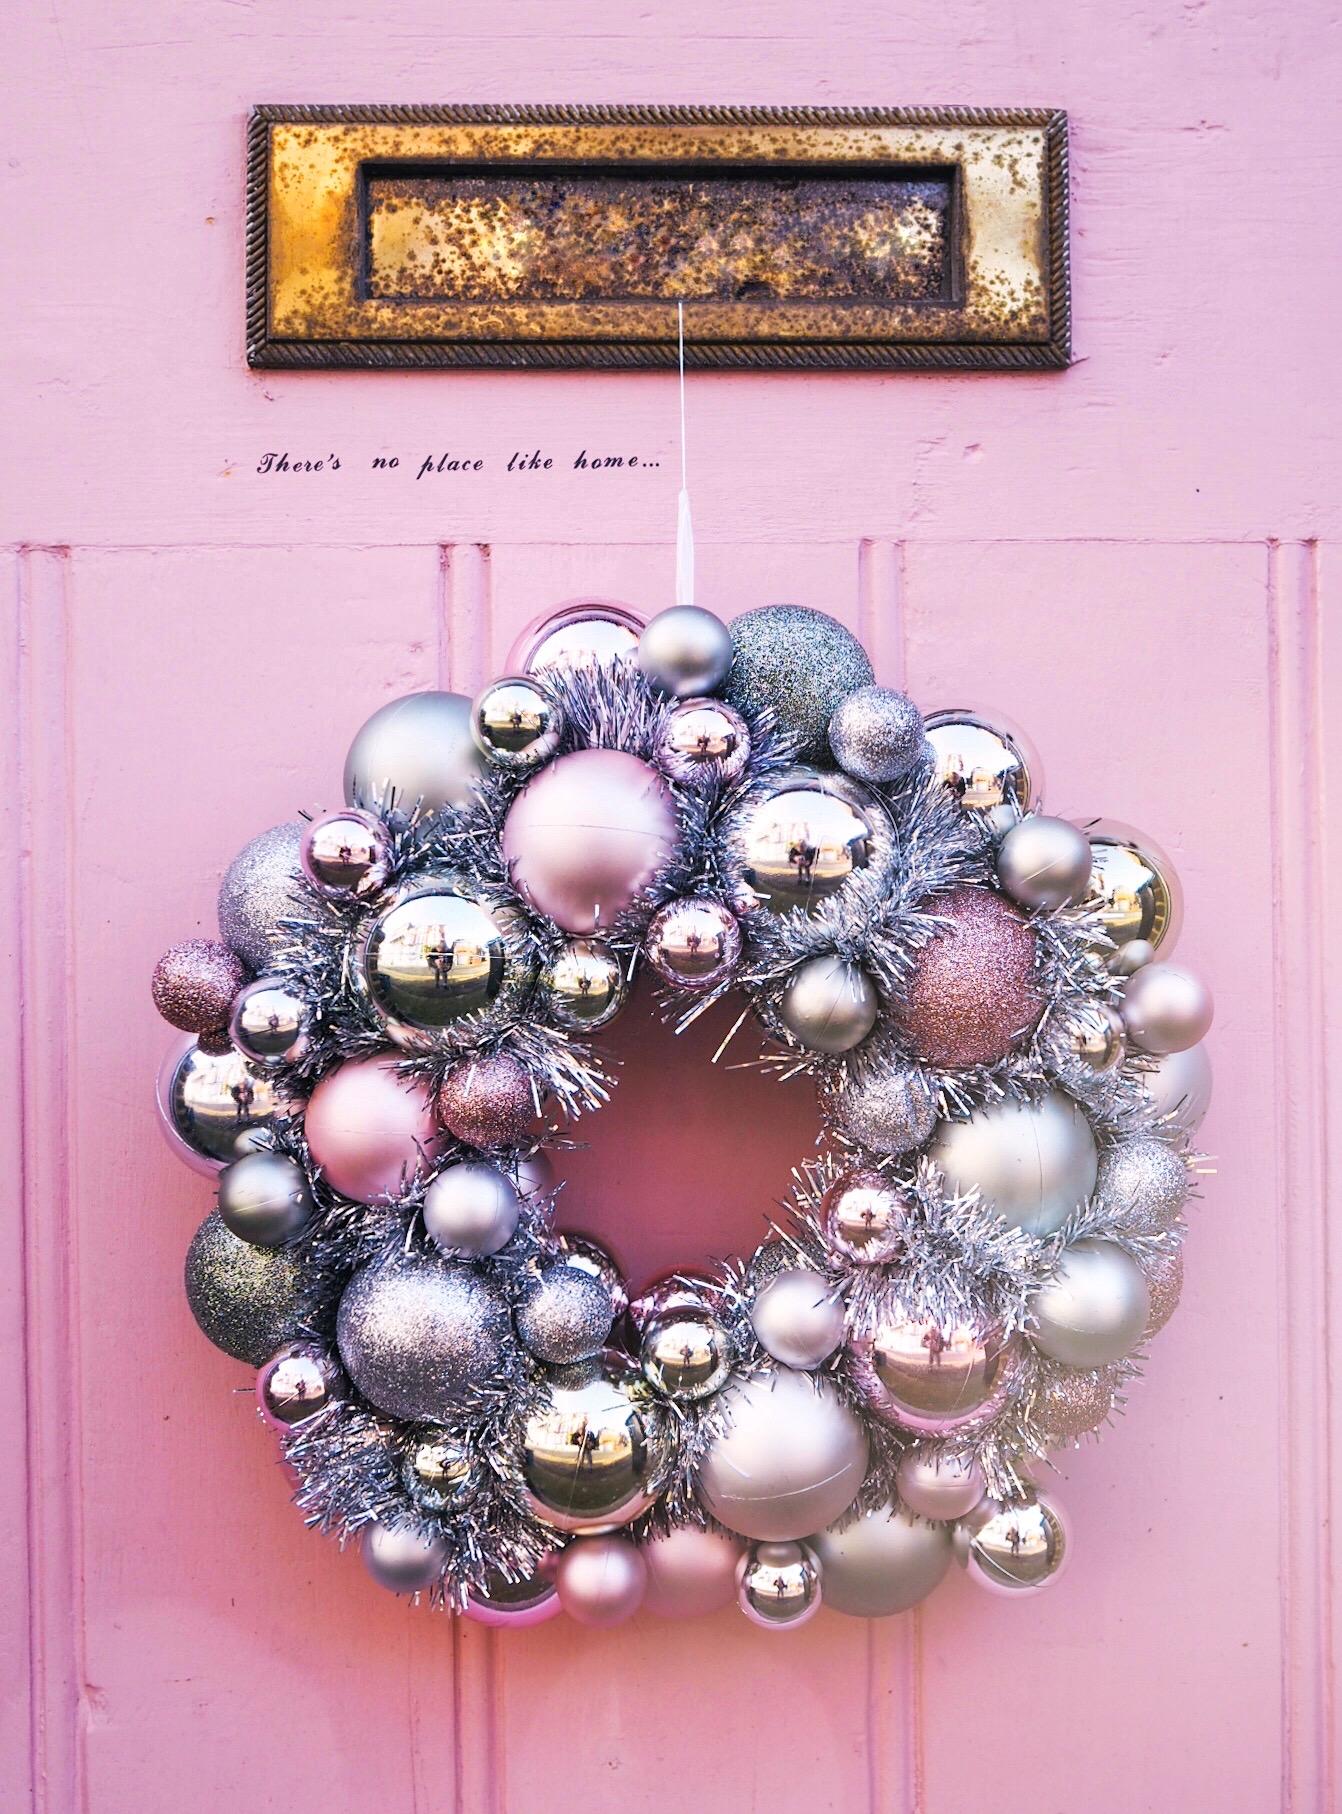 matalan-christmas-2019-wreath pink door there's no place like home door